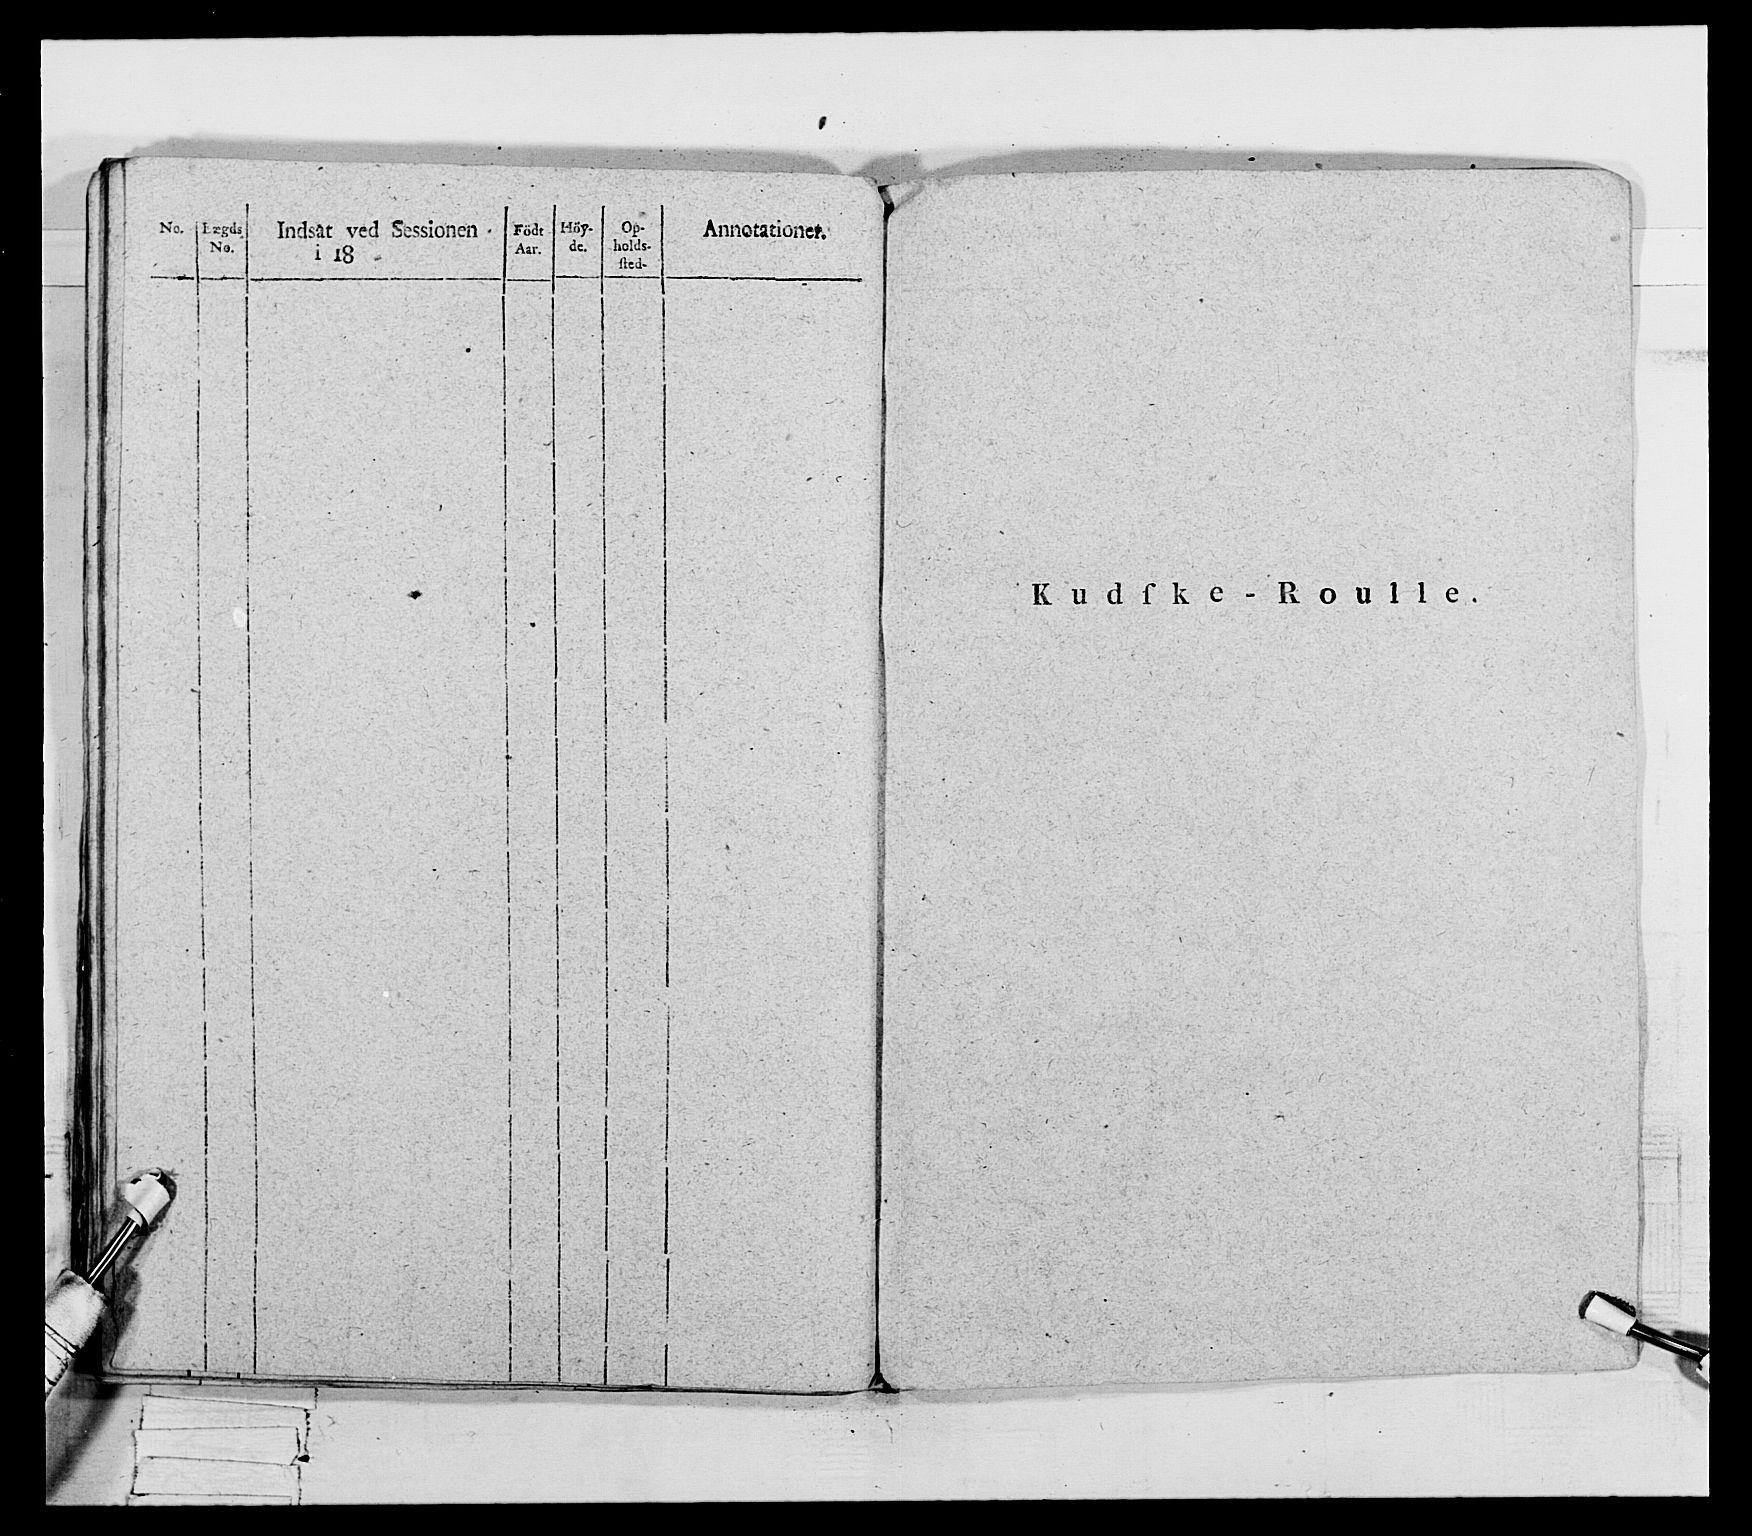 RA, Generalitets- og kommissariatskollegiet, Det kongelige norske kommissariatskollegium, E/Eh/L0069: Opplandske gevorbne infanteriregiment, 1810-1818, s. 262